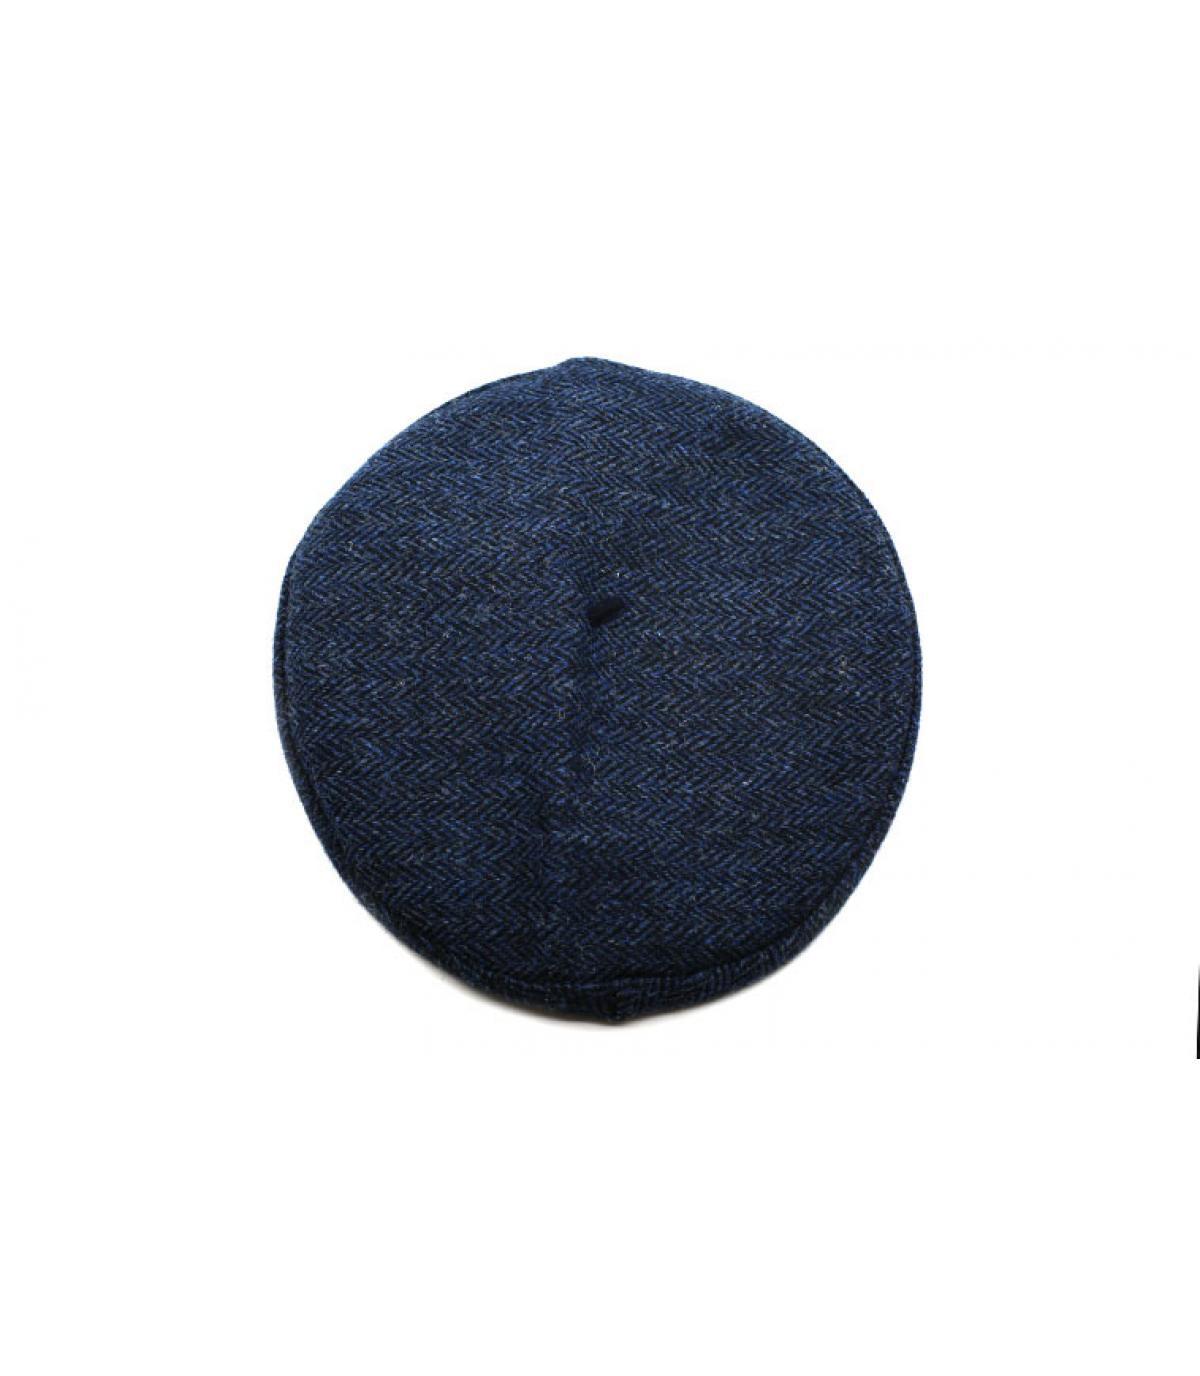 béret bleu tweed